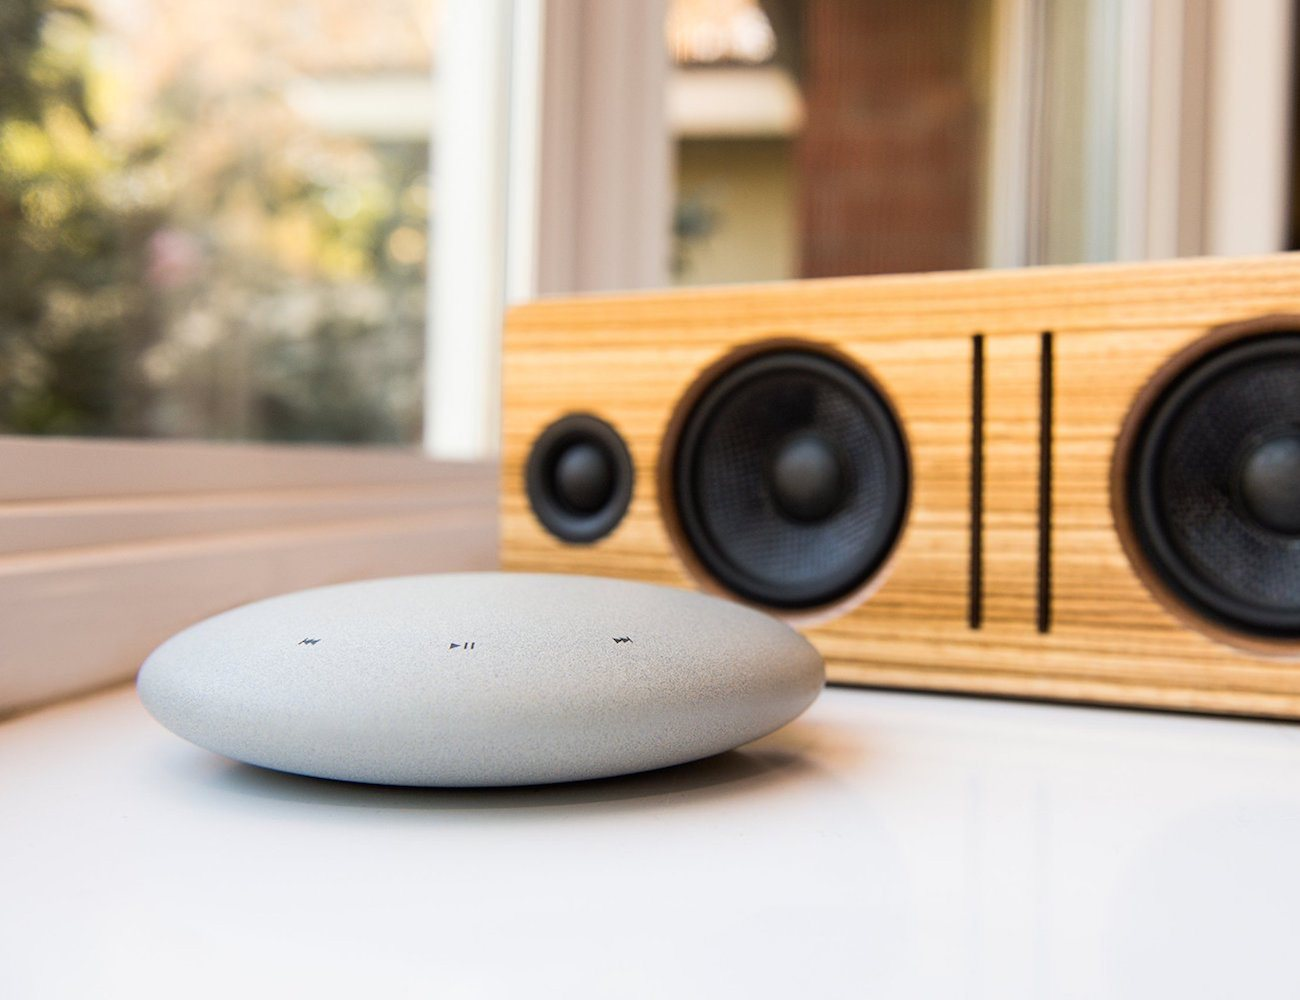 Cobblestone+%26%238211%3B+Wi-Fi+Audio+Receiver+By+Muzo